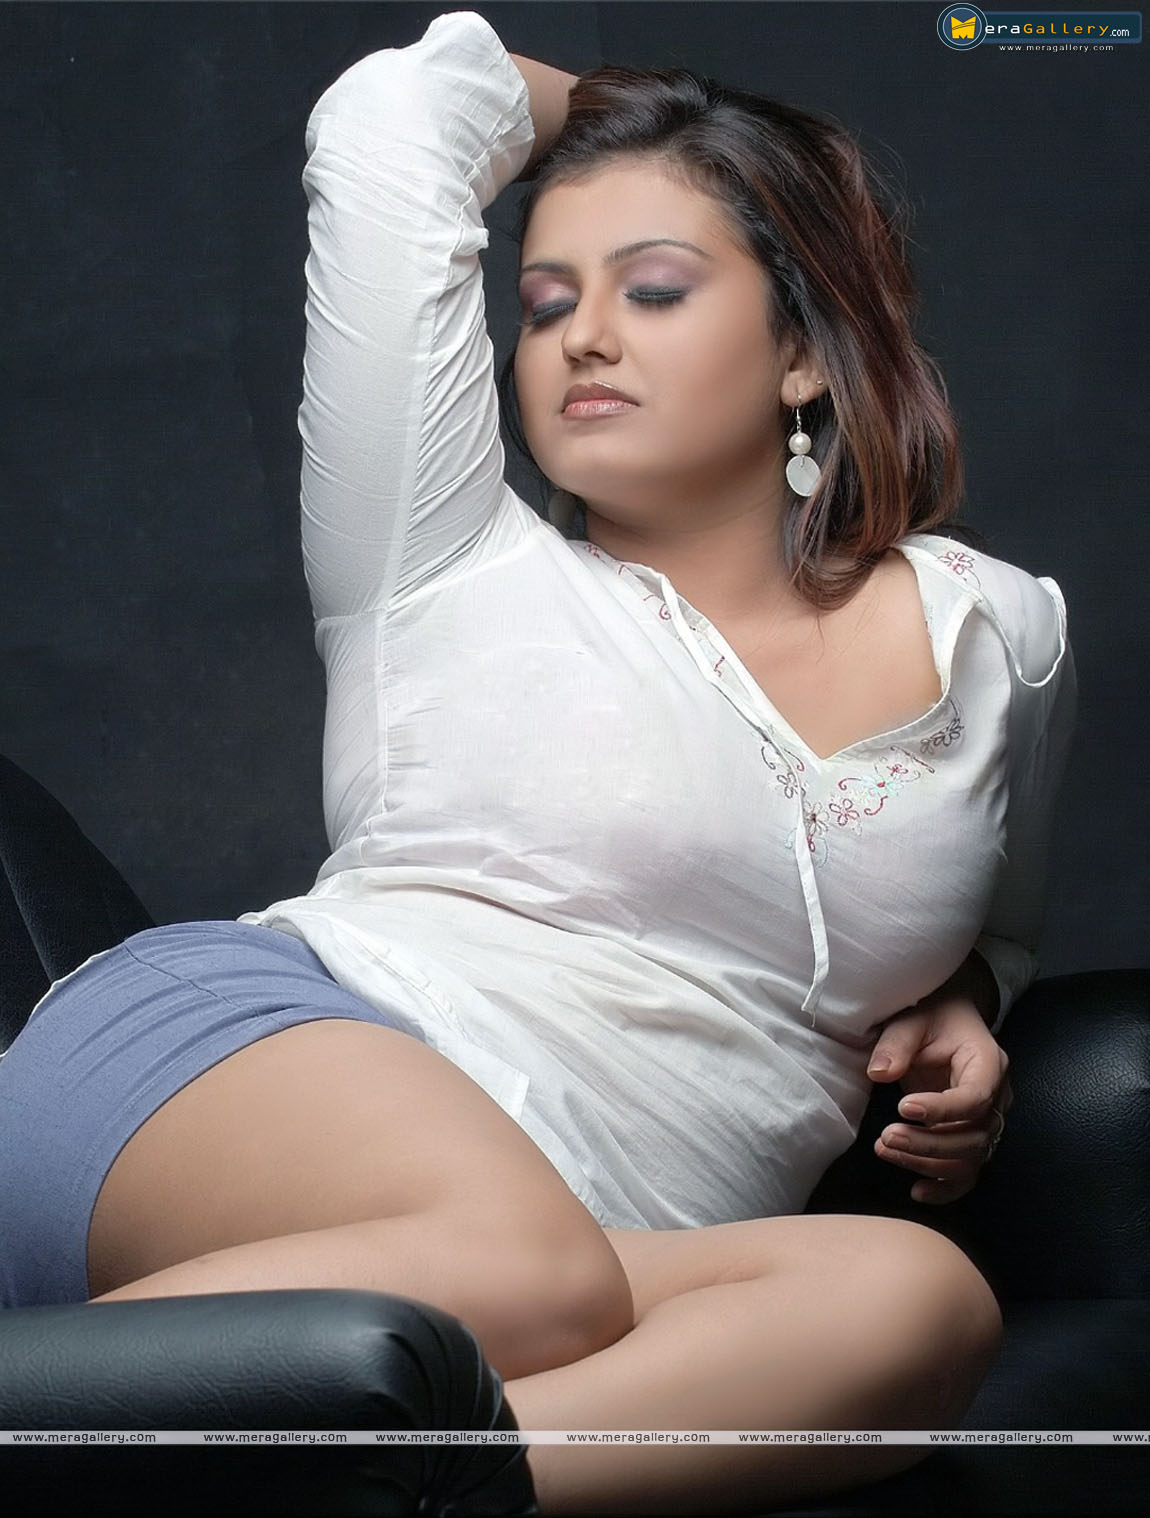 Homemade big tits porn